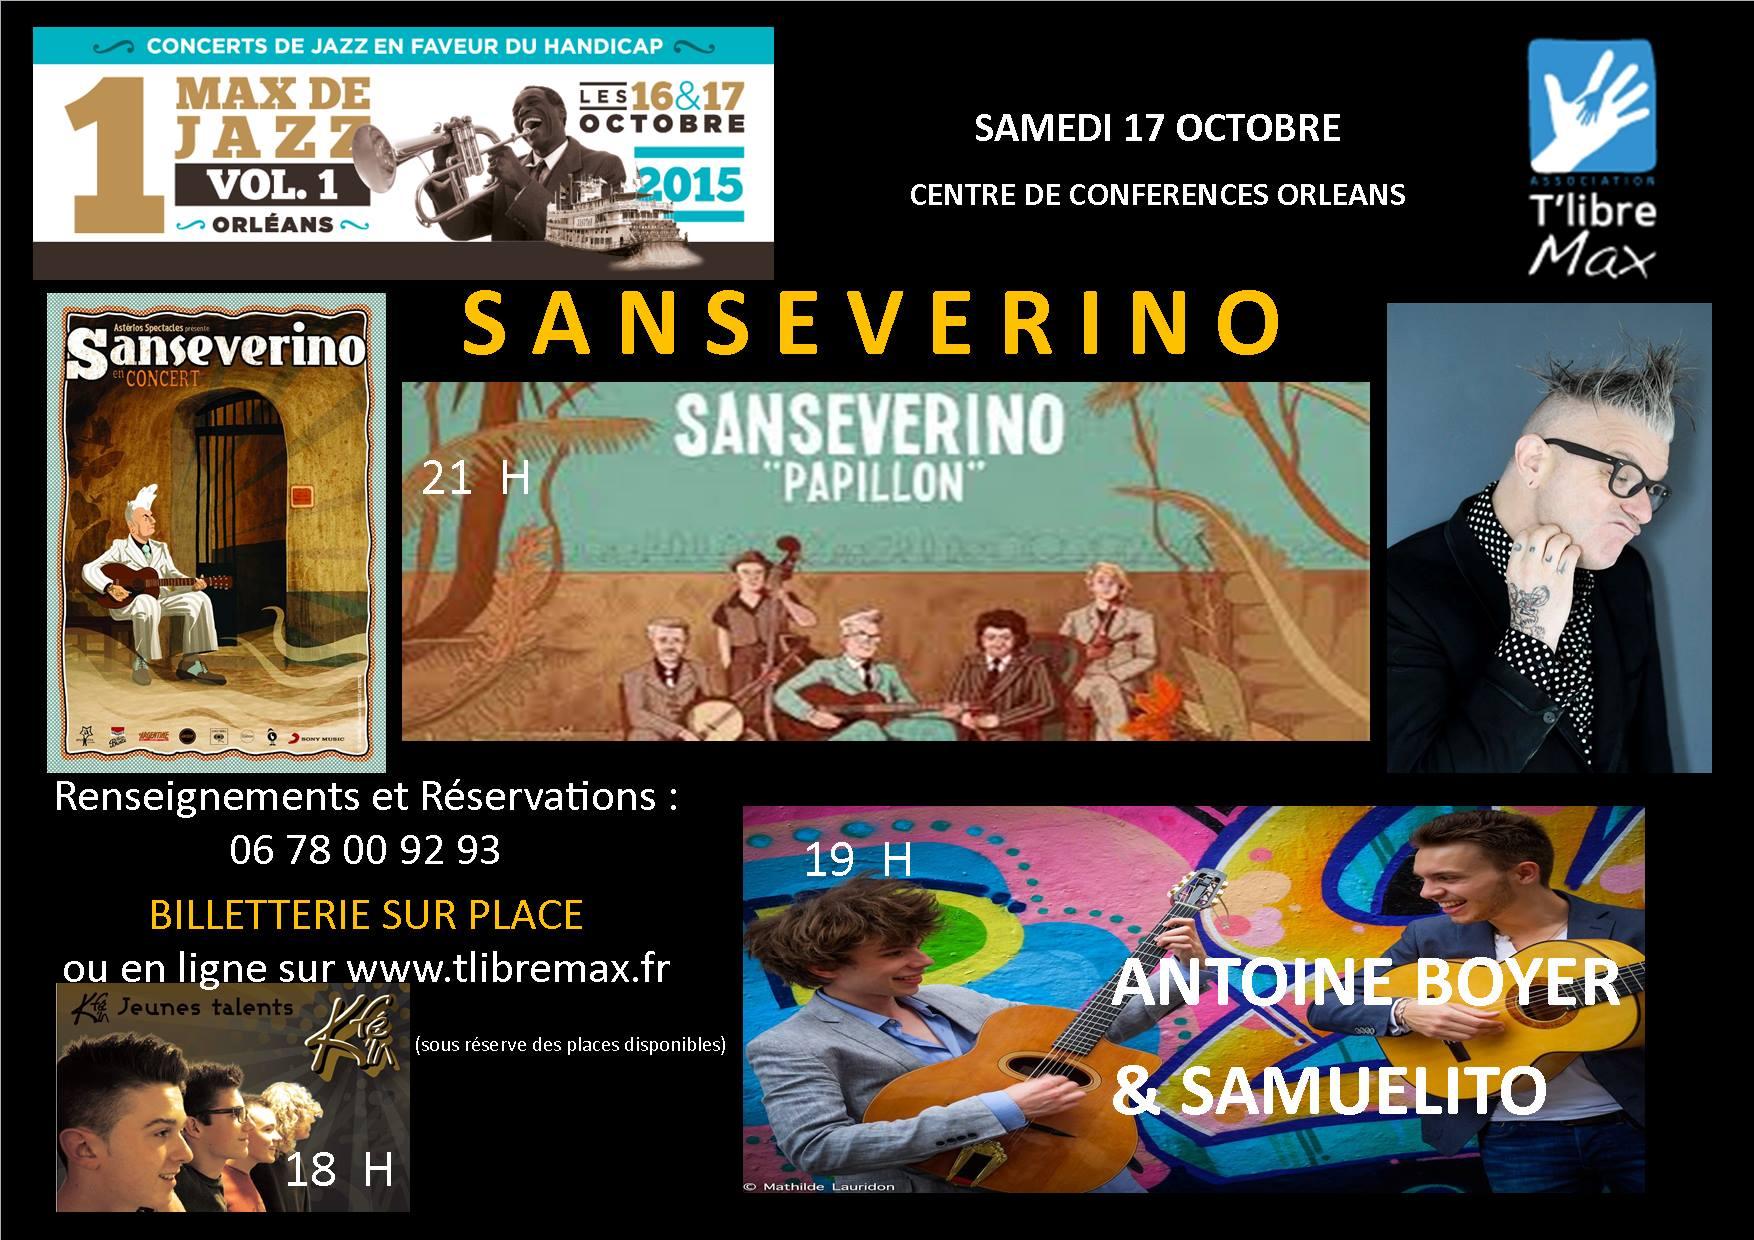 "17 Octobre 2015 Kfe'in, Antoine Boyer & Samuelito, Sanseverino à Orléans ""Centre de Conférence"""